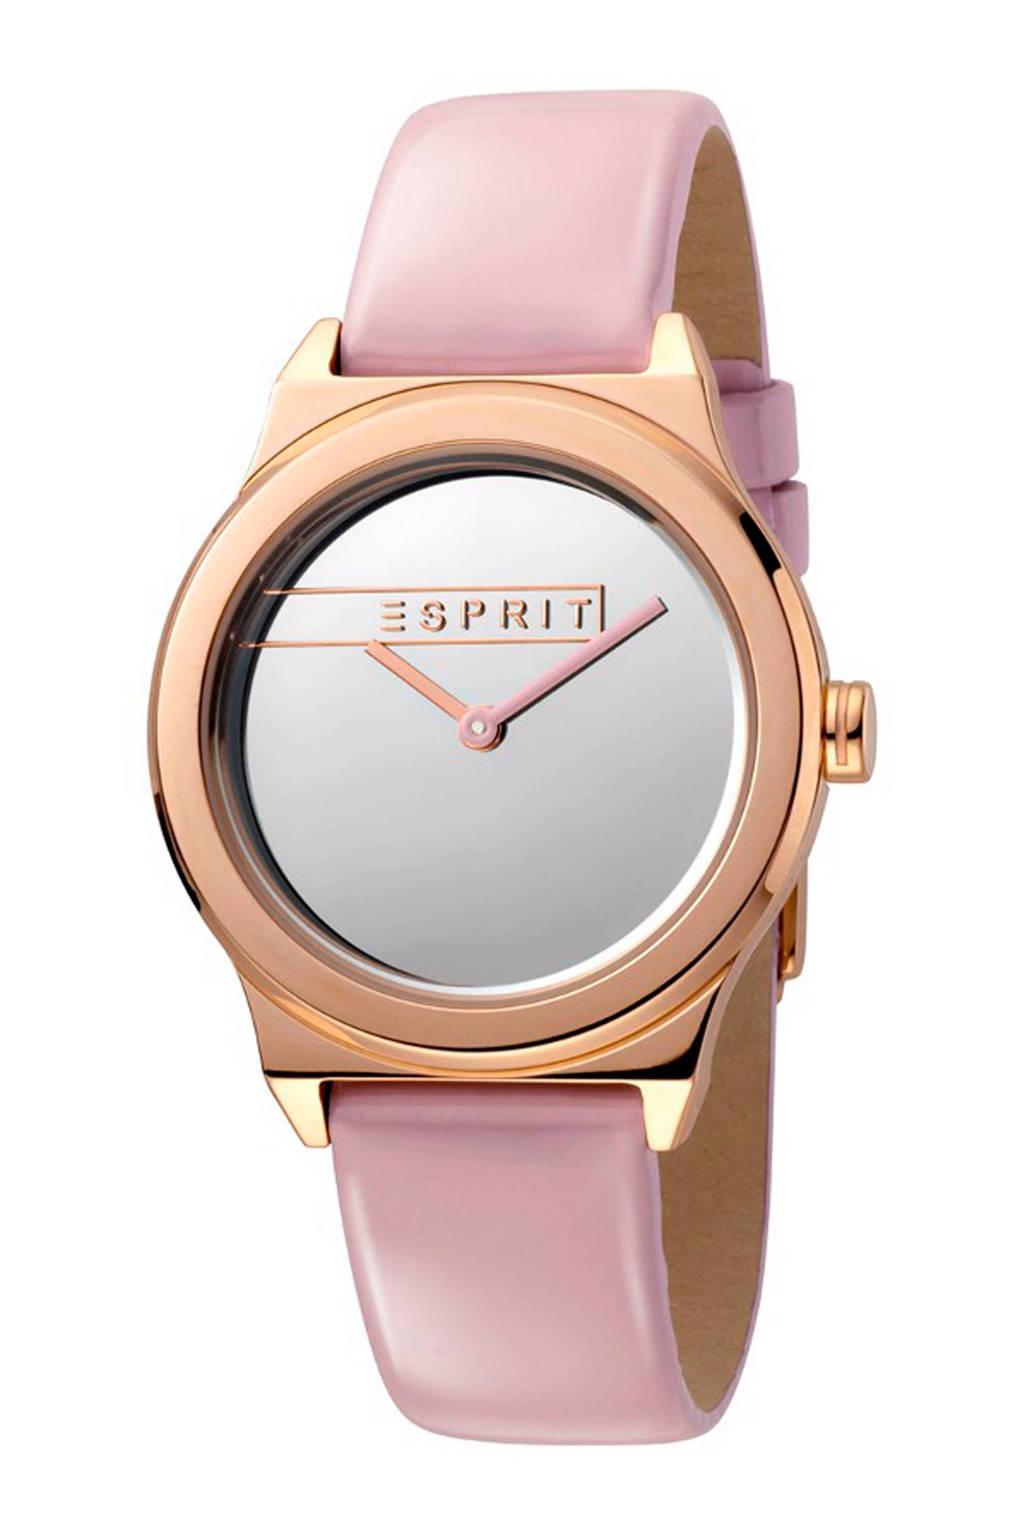 ESPRIT Magnolia horloge - ES1L019L0045, Roze